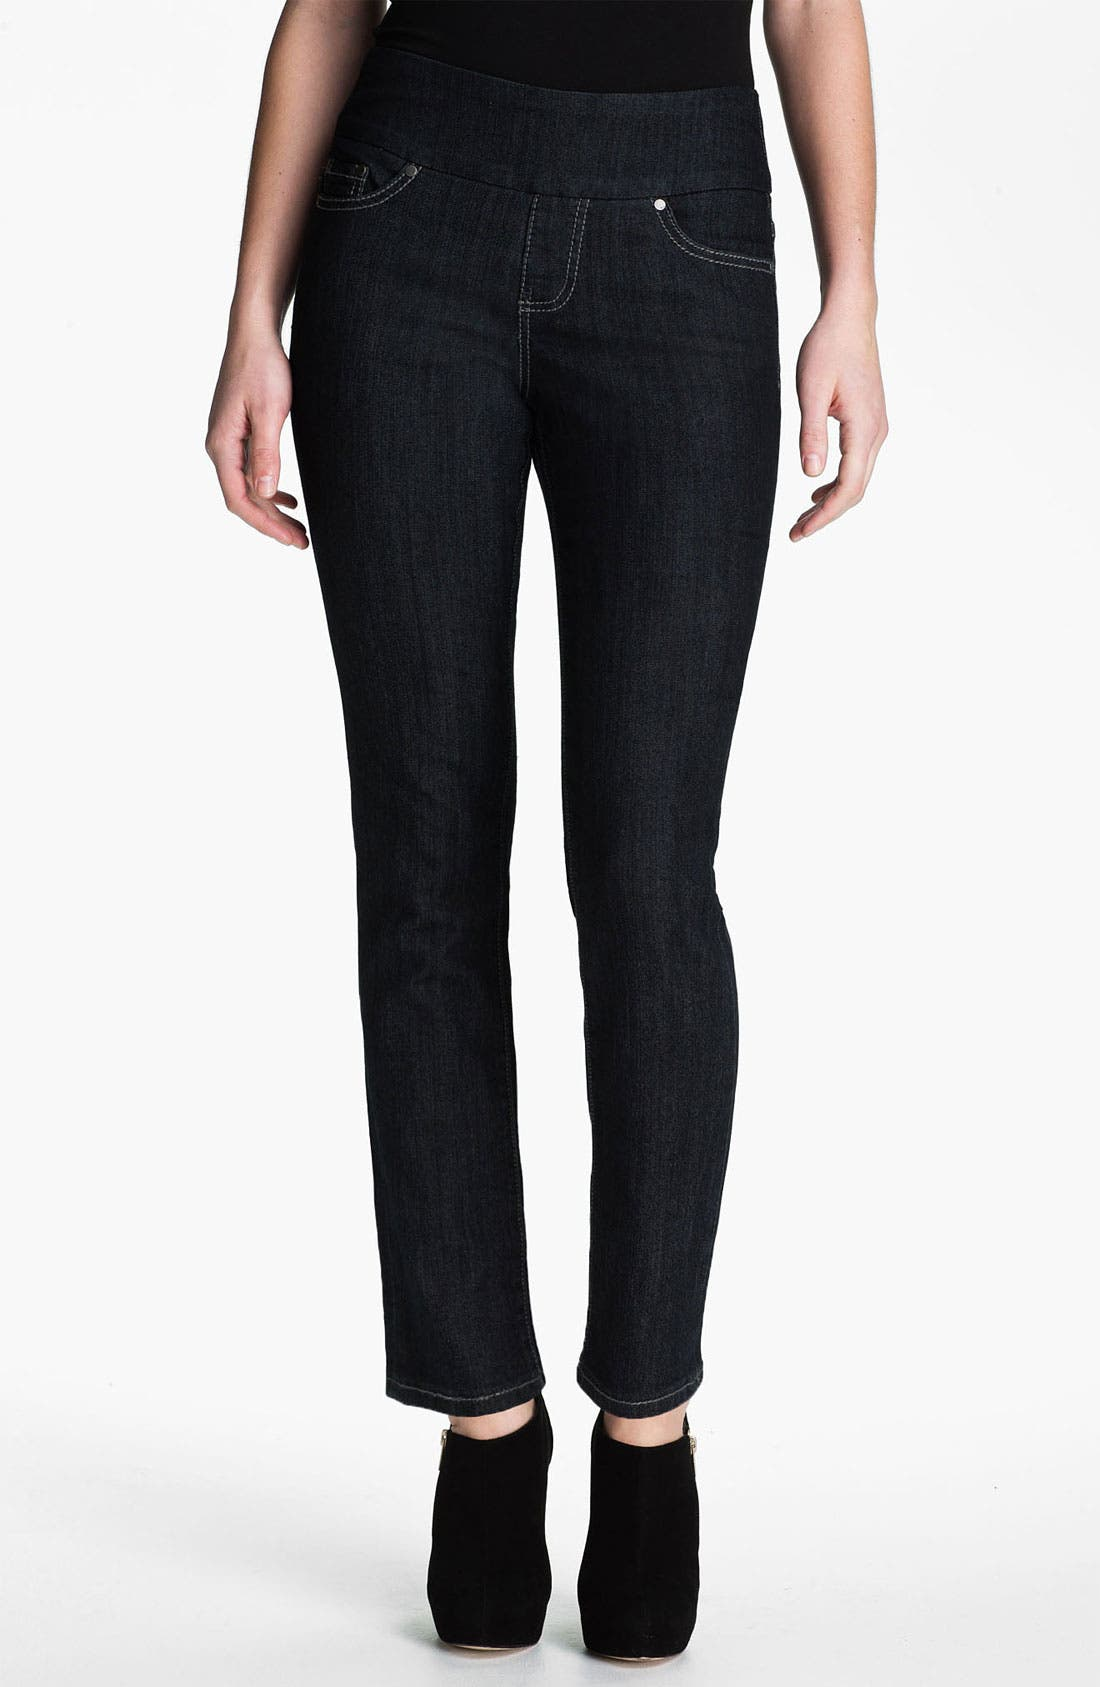 Main Image - Jag Jeans 'Holland' Straight Leg Pull-On Jeans (Petite)